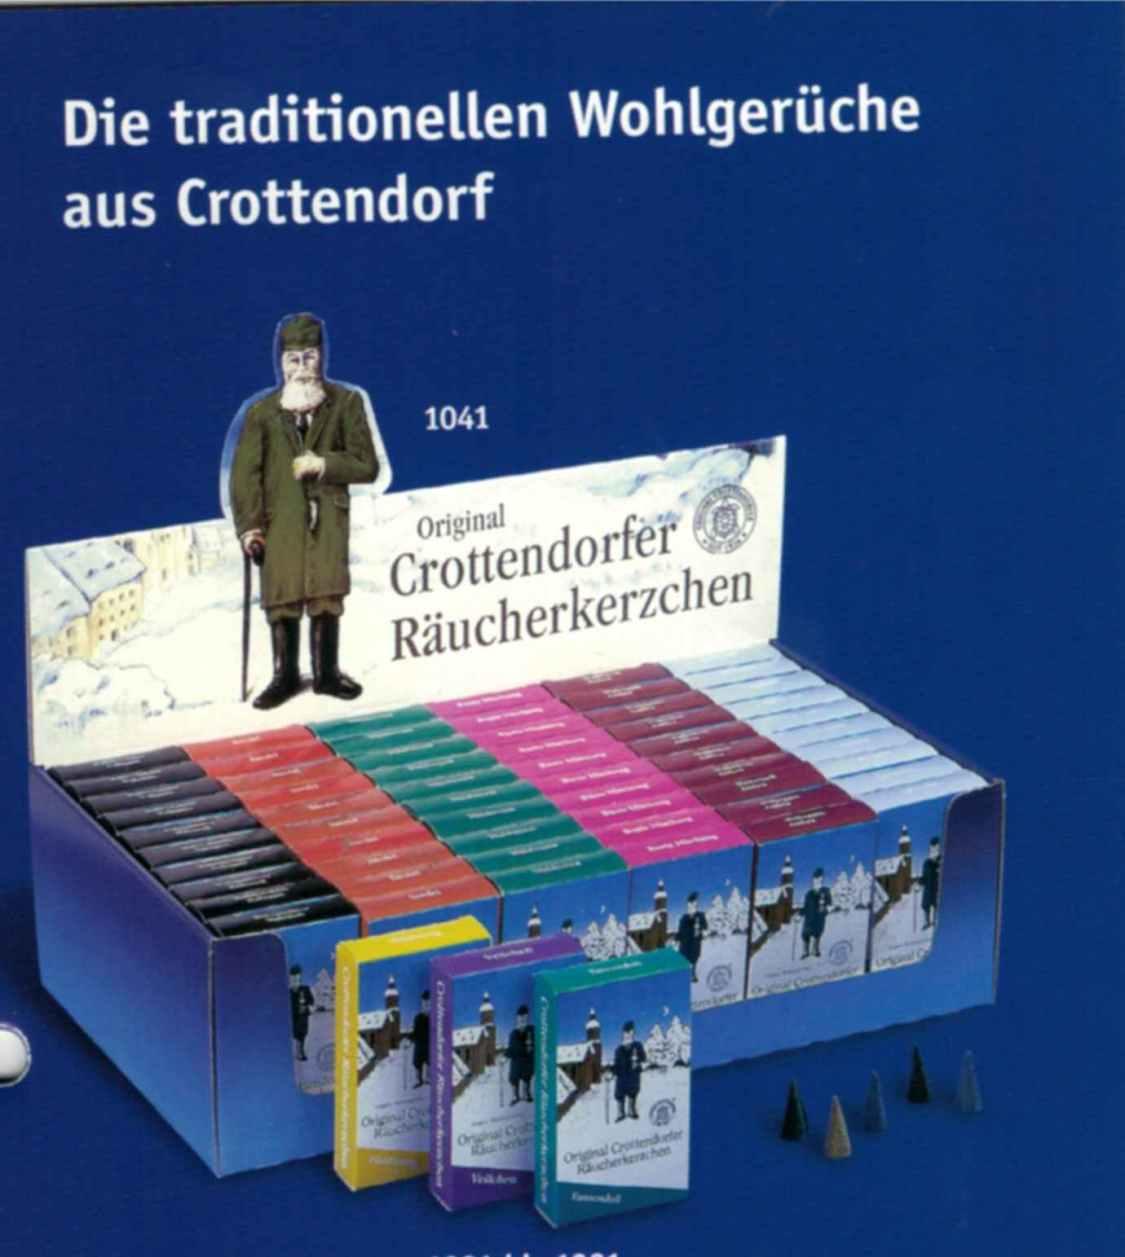 Crottendorfer Räucherkerzen 46 verschiedene Sorten u.Größen XS, M, L, XL,XXL